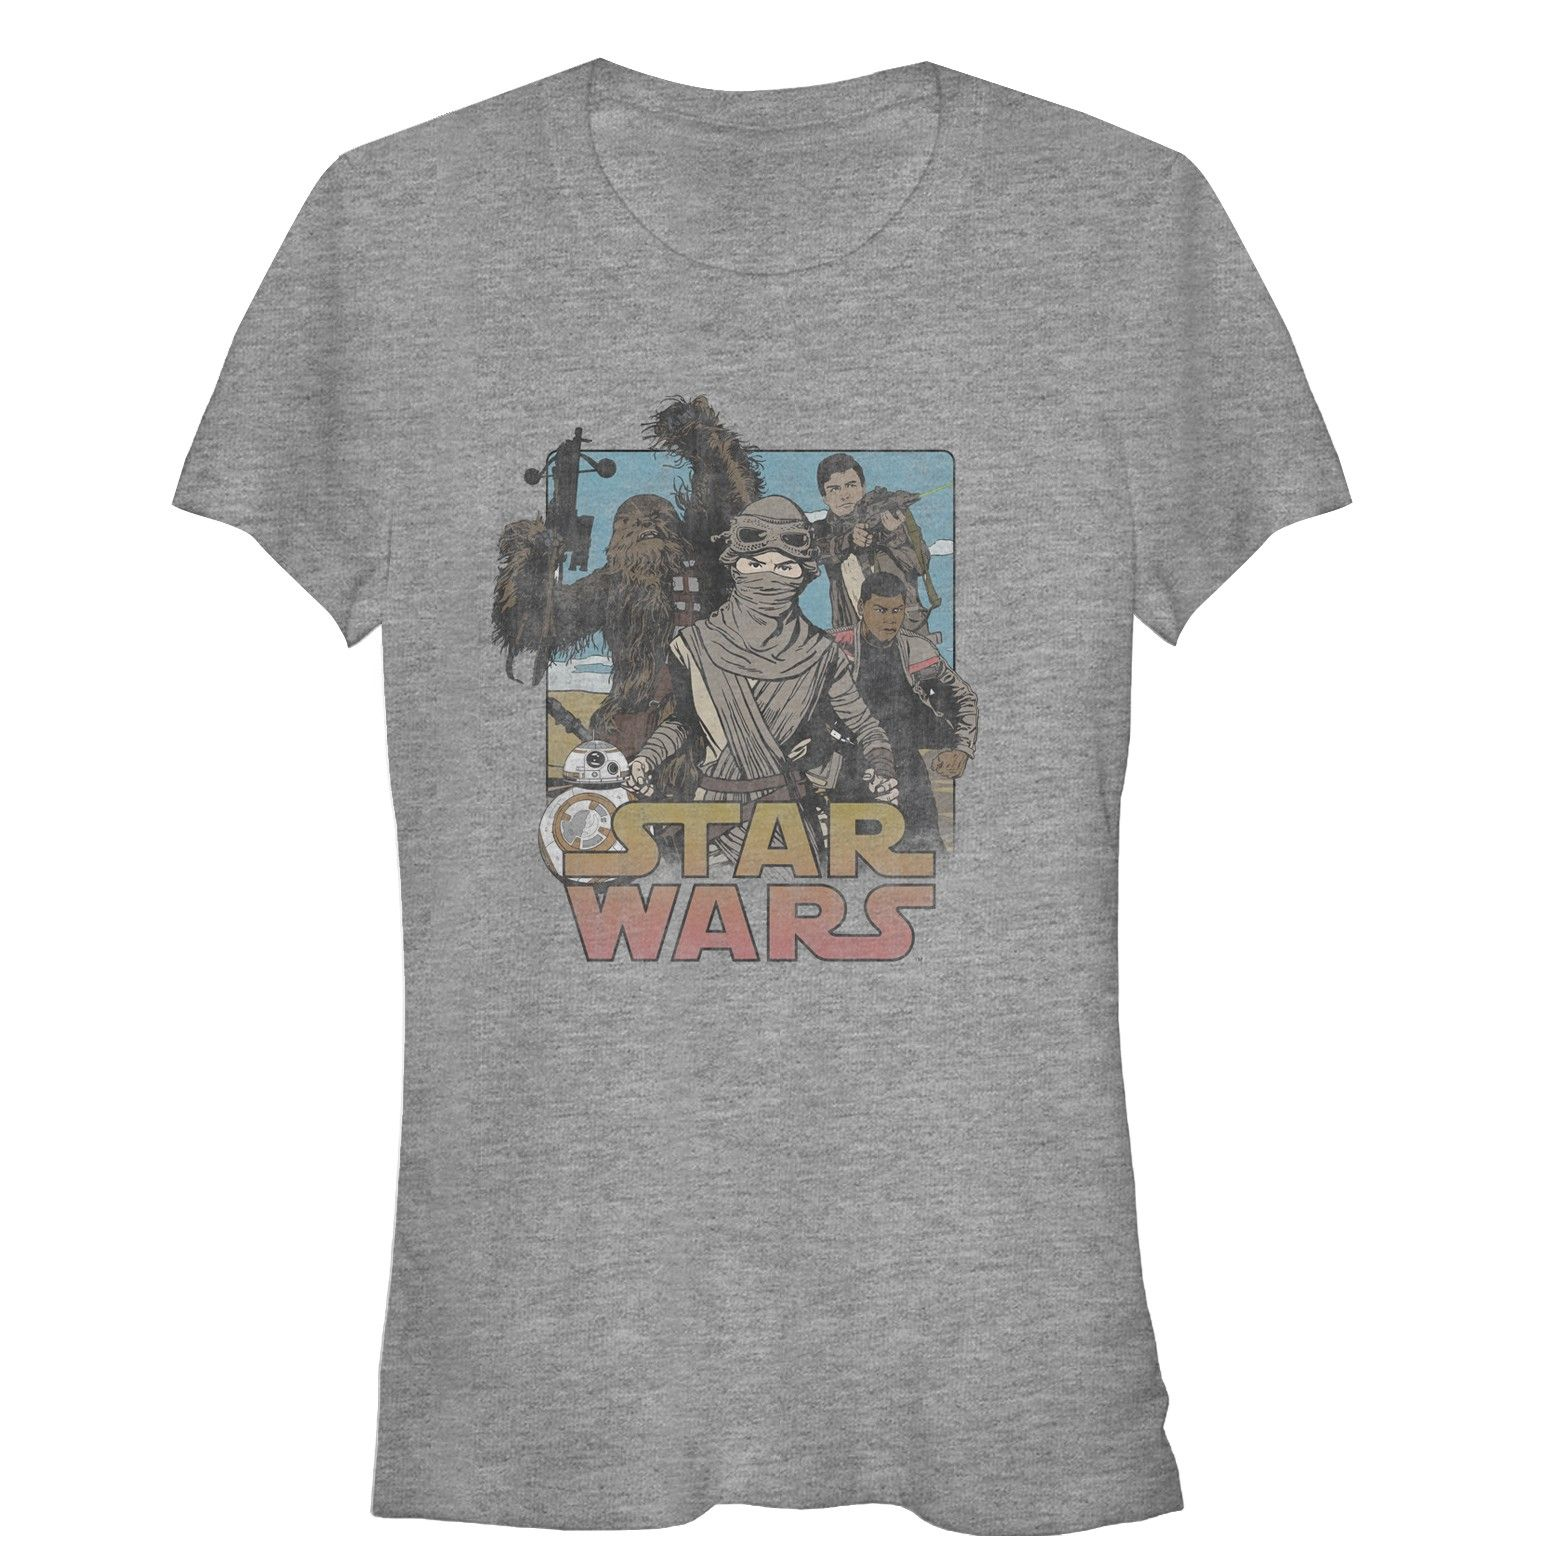 Star Wars Rebel Alliance T-Shirt Homme